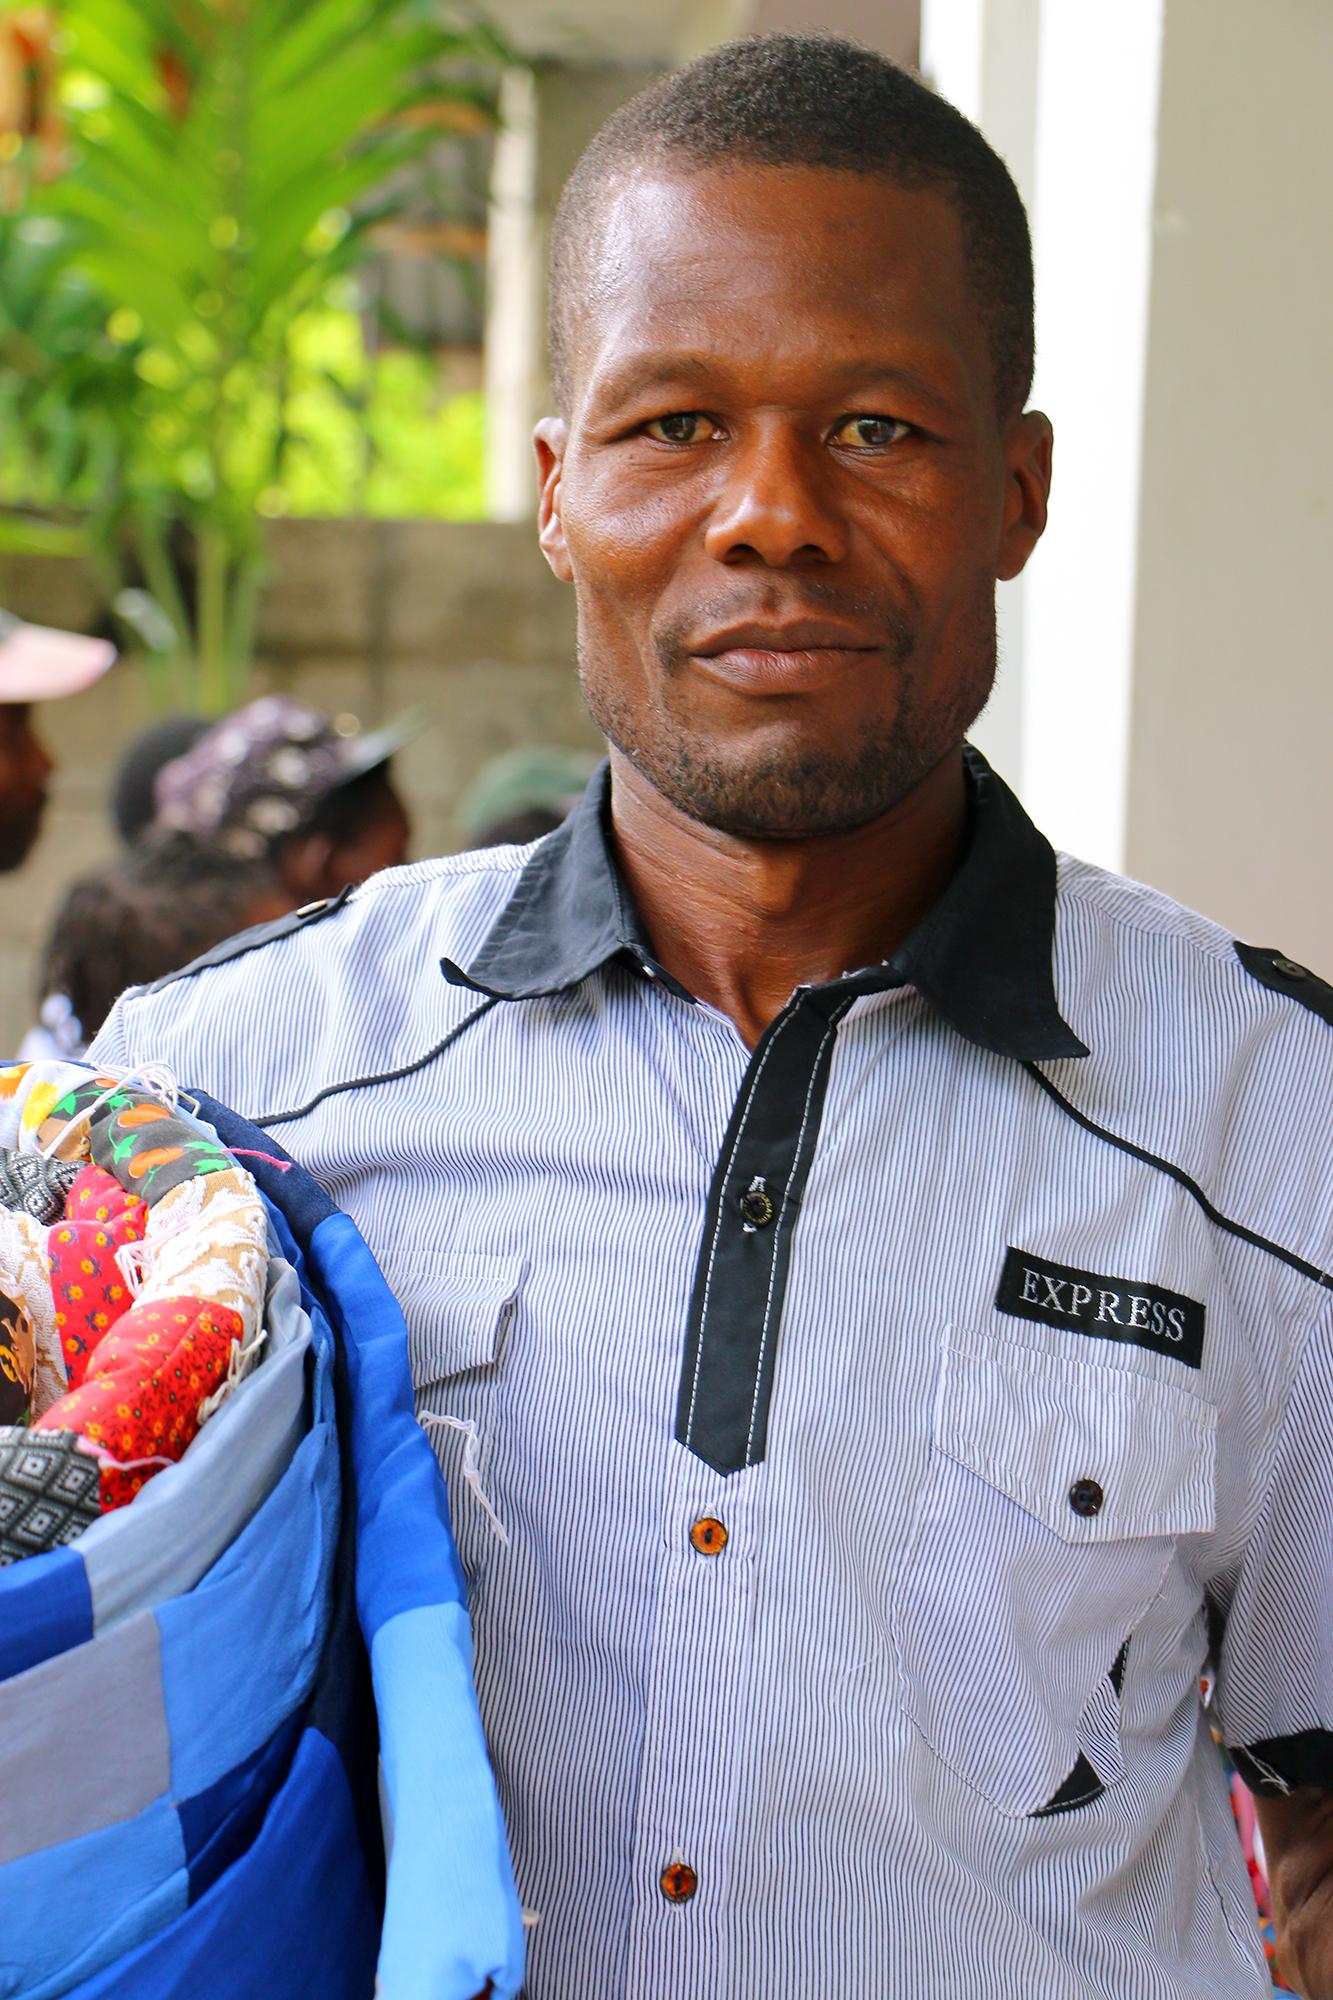 Bosto Poco receives MCC material aid in La Chapelle,Haiti, after Hurricane Irma struck the region in September, 2017. MCC Photo/Annalee Giesbrecht